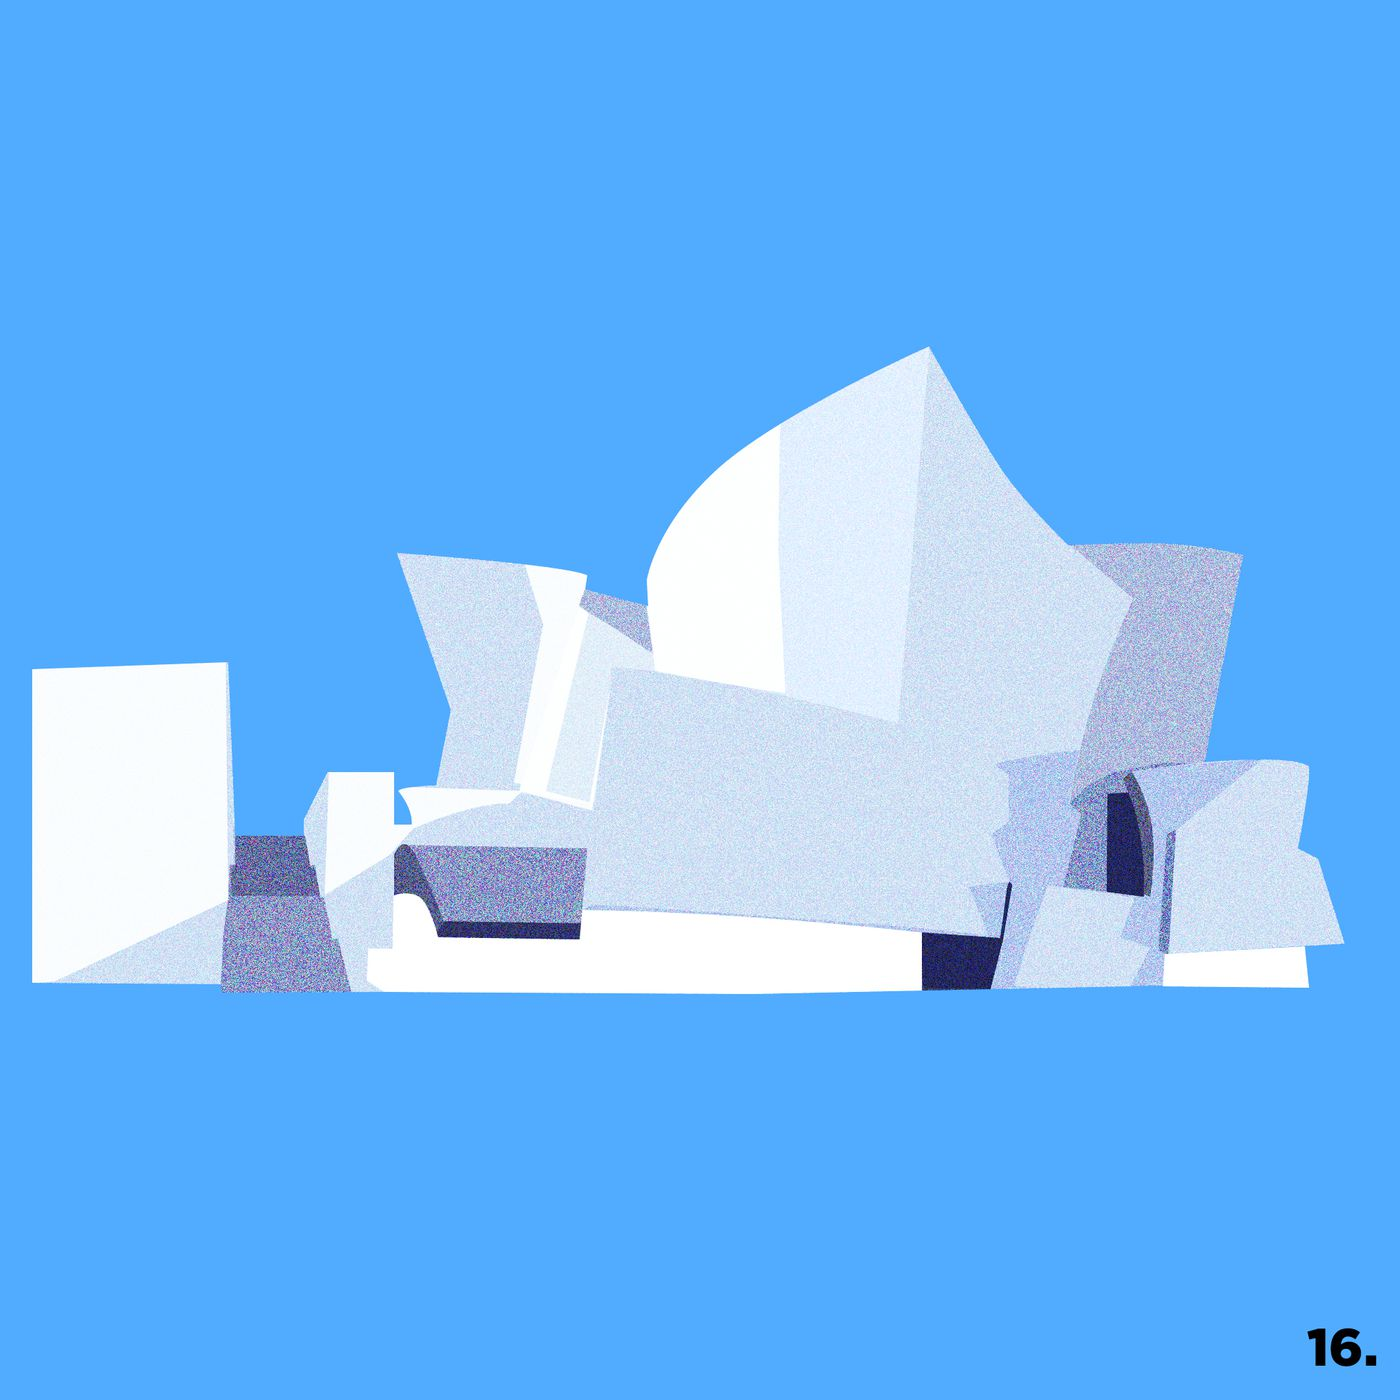 Style De Veranda Moderne los angeles architecture: an illustrated guide - curbed la